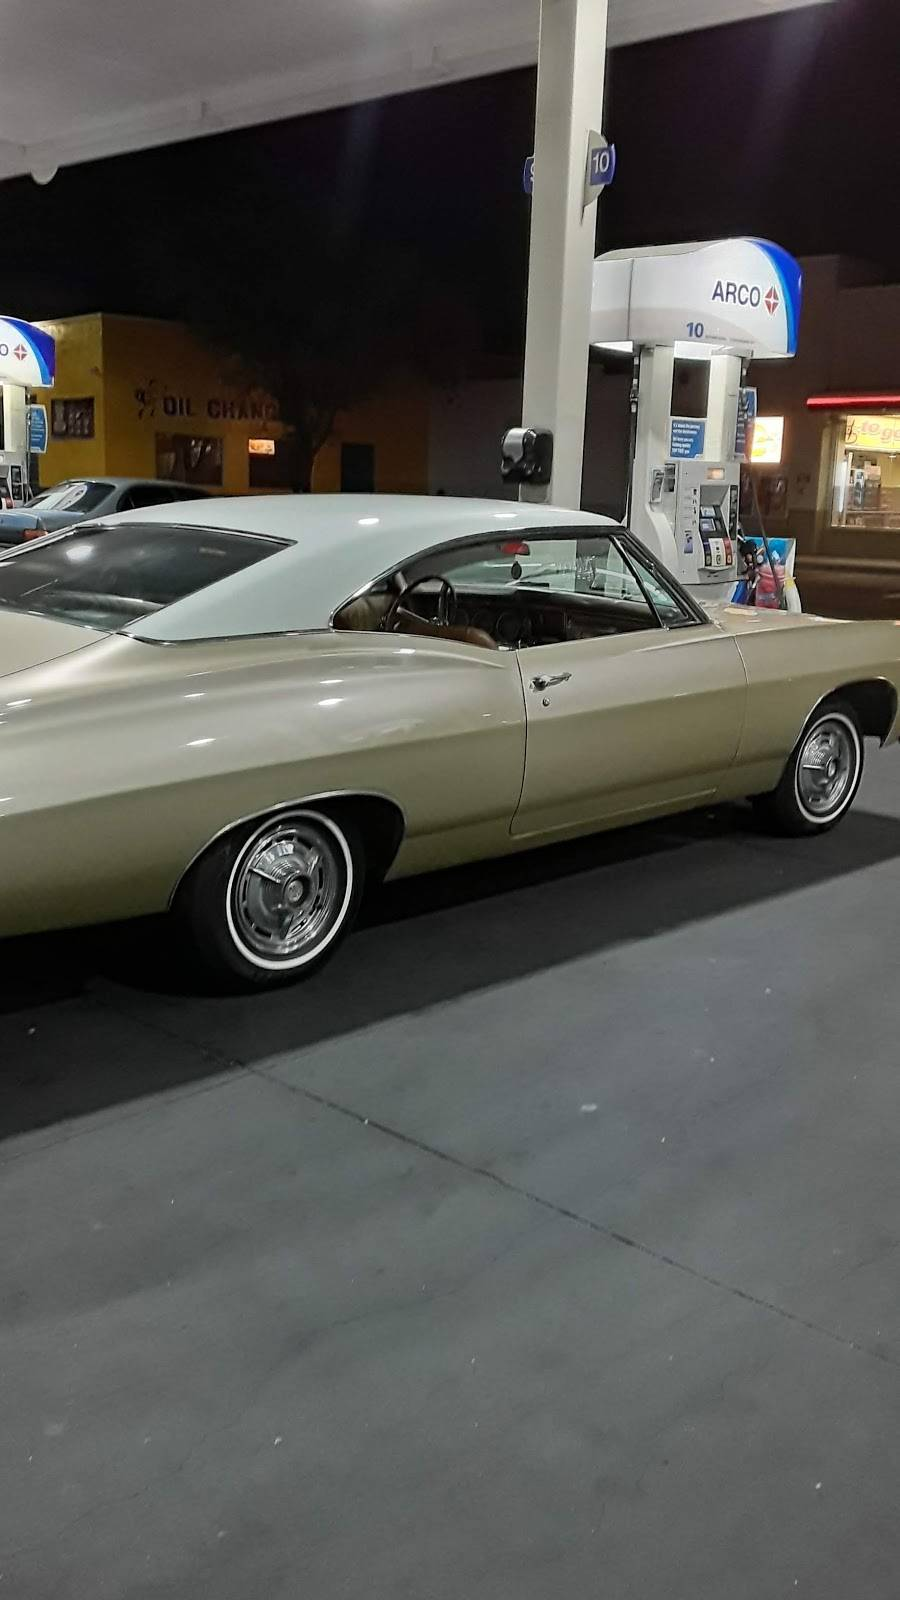 Blakes Auto Body&Paint - car repair  | Photo 4 of 10 | Address: Mobile service only, 7554w, W Heatherbrae Dr, Phoenix, AZ 85033, USA | Phone: (480) 524-3028